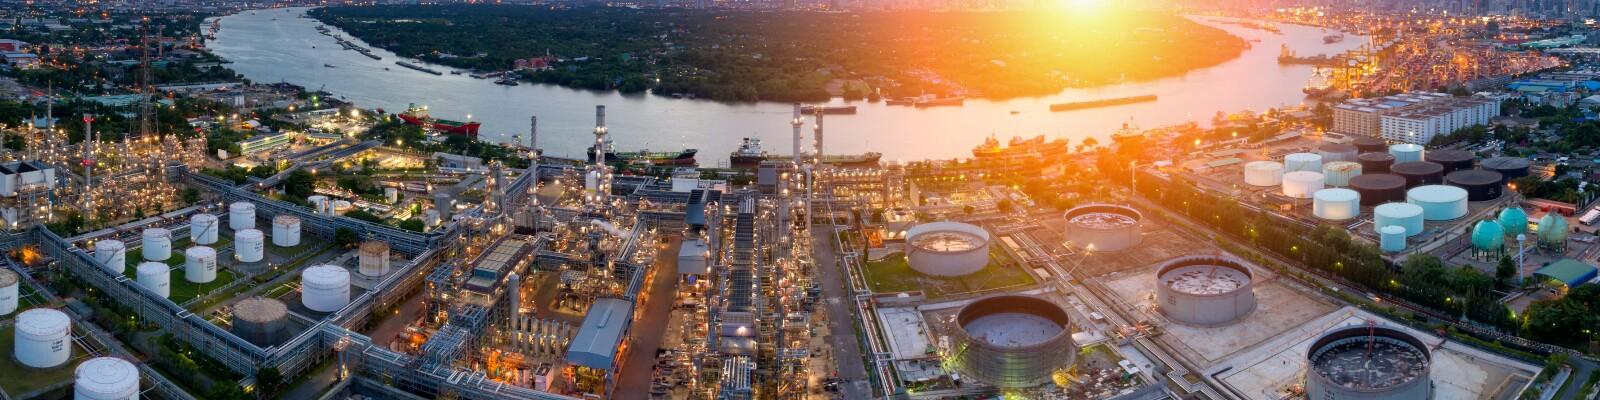 Refinery off the Gulf Coast